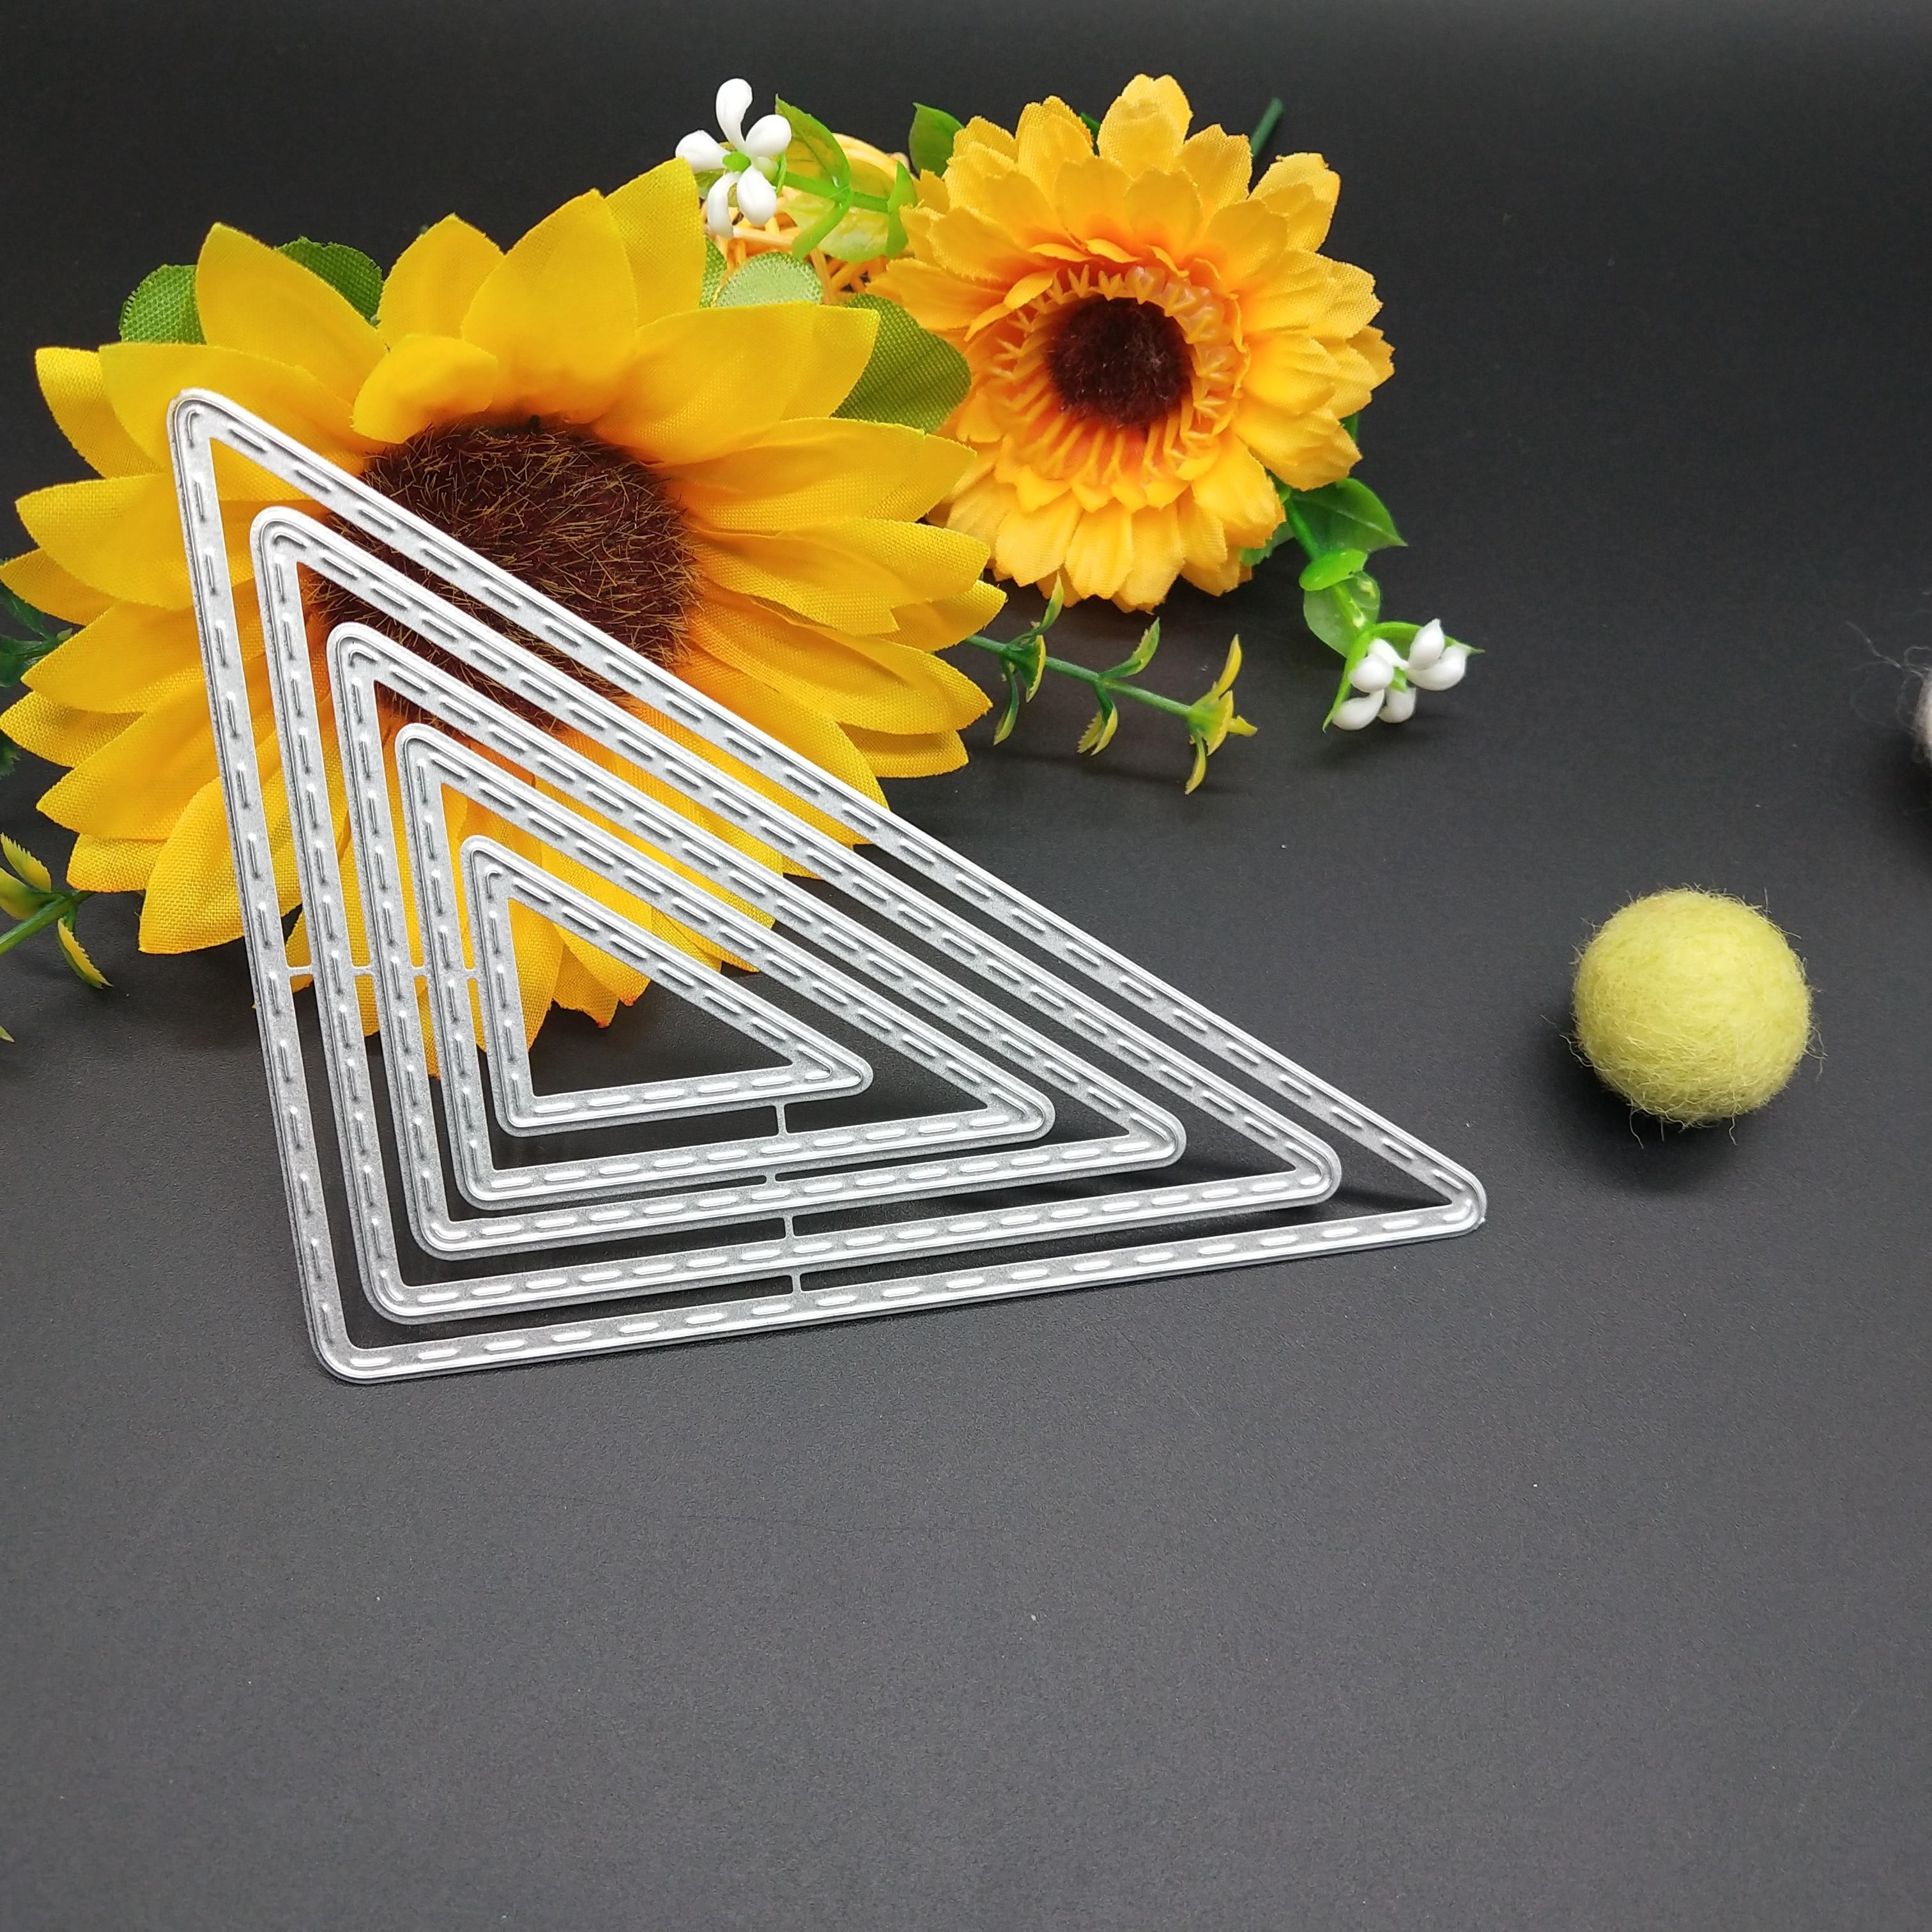 90 112mm Cascading frame new Metal Cutting Dies for decoration card DIY Scrapbooking stencil Paper Craft Album template Dies in Cutting Dies from Home Garden